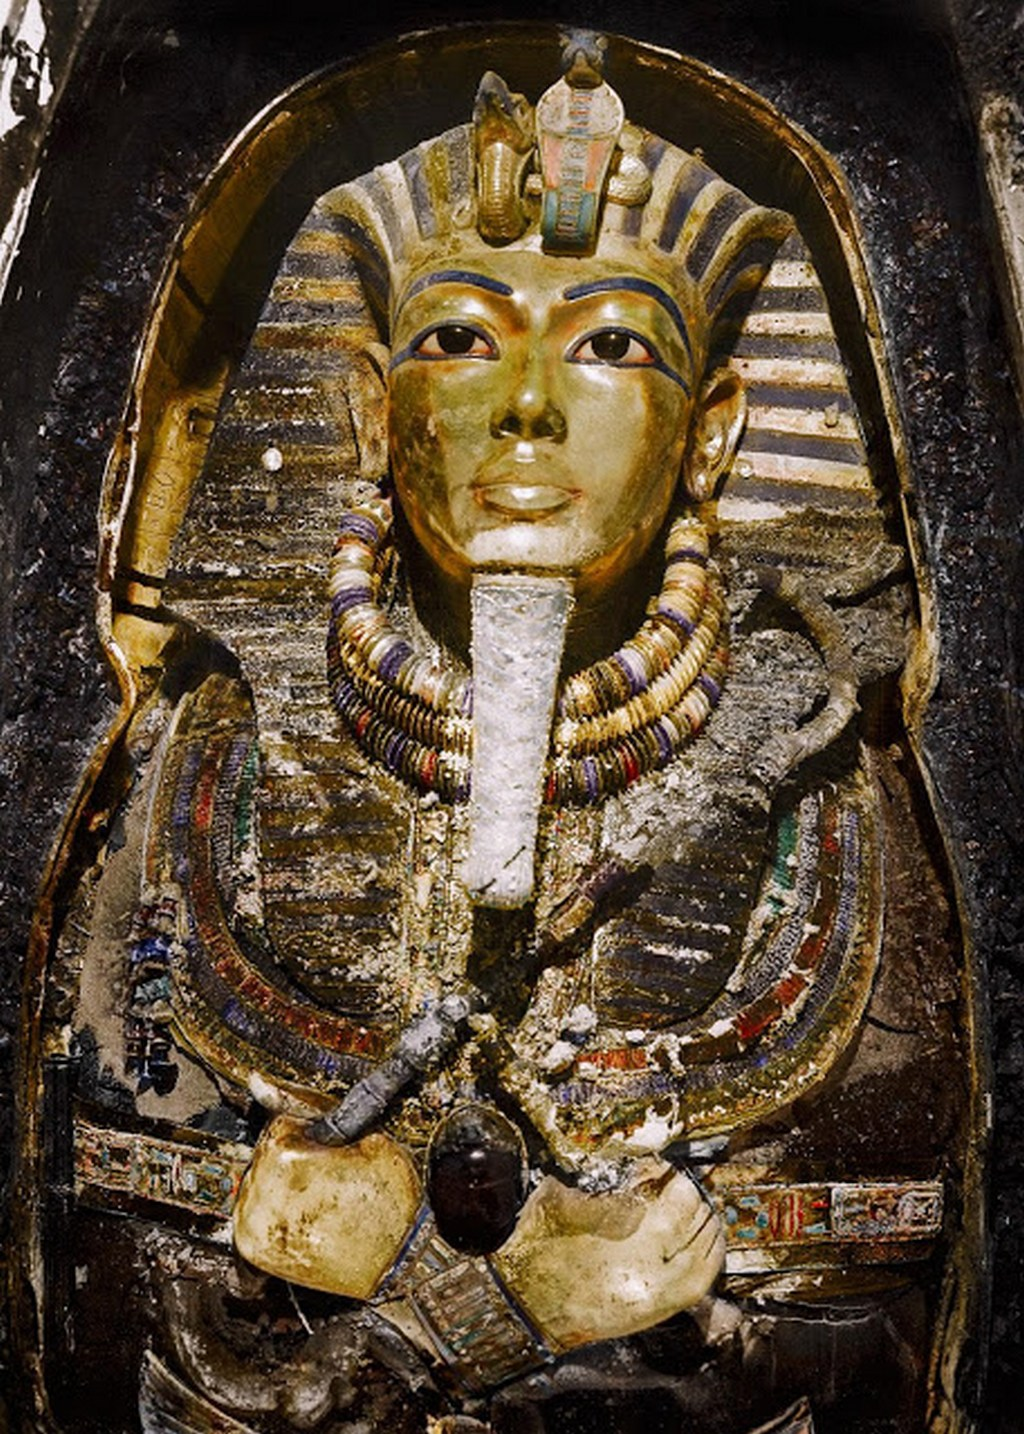 discovering_tutankhamun_in_color_2819_29.jpg